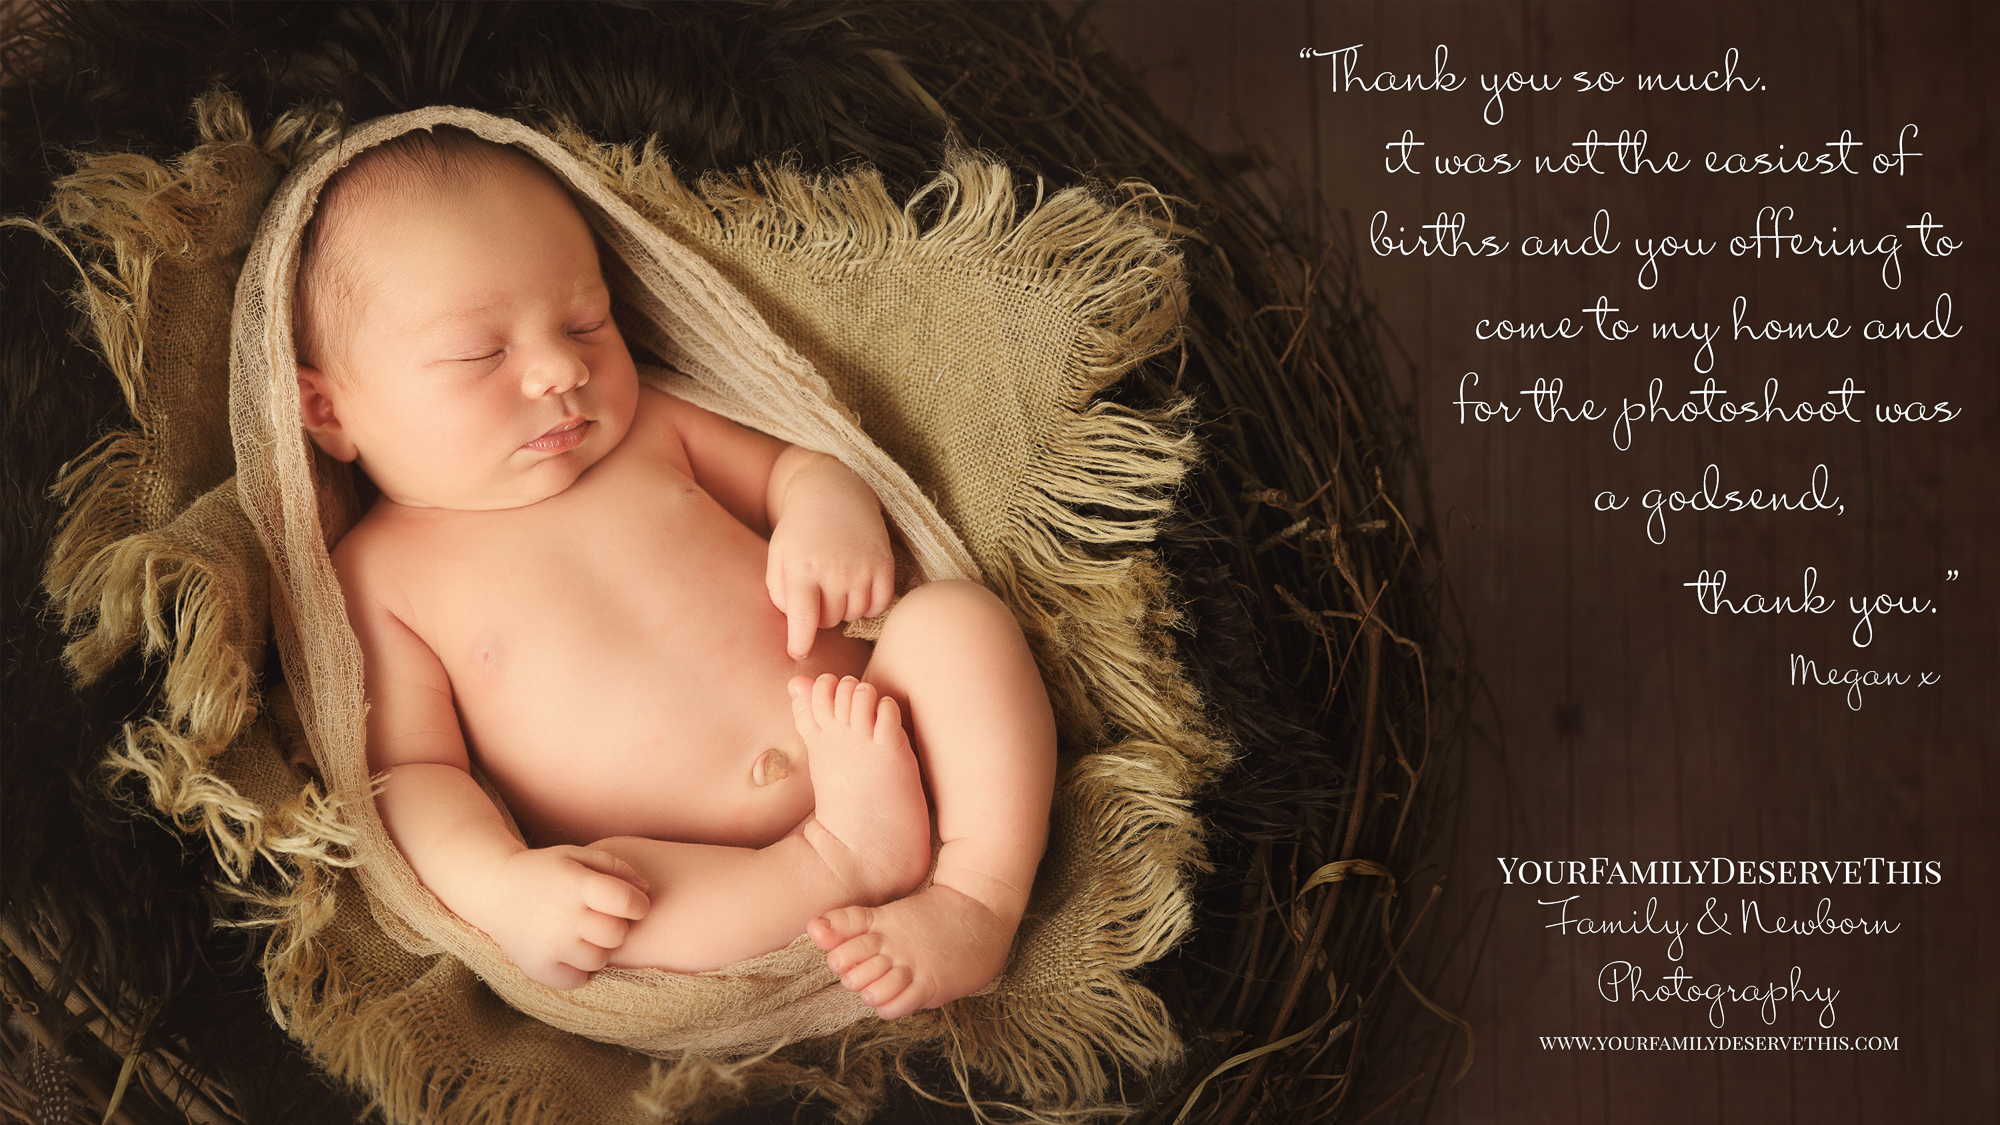 1a newborn baby in a nest - newborn photography studio Hampshire.jpg